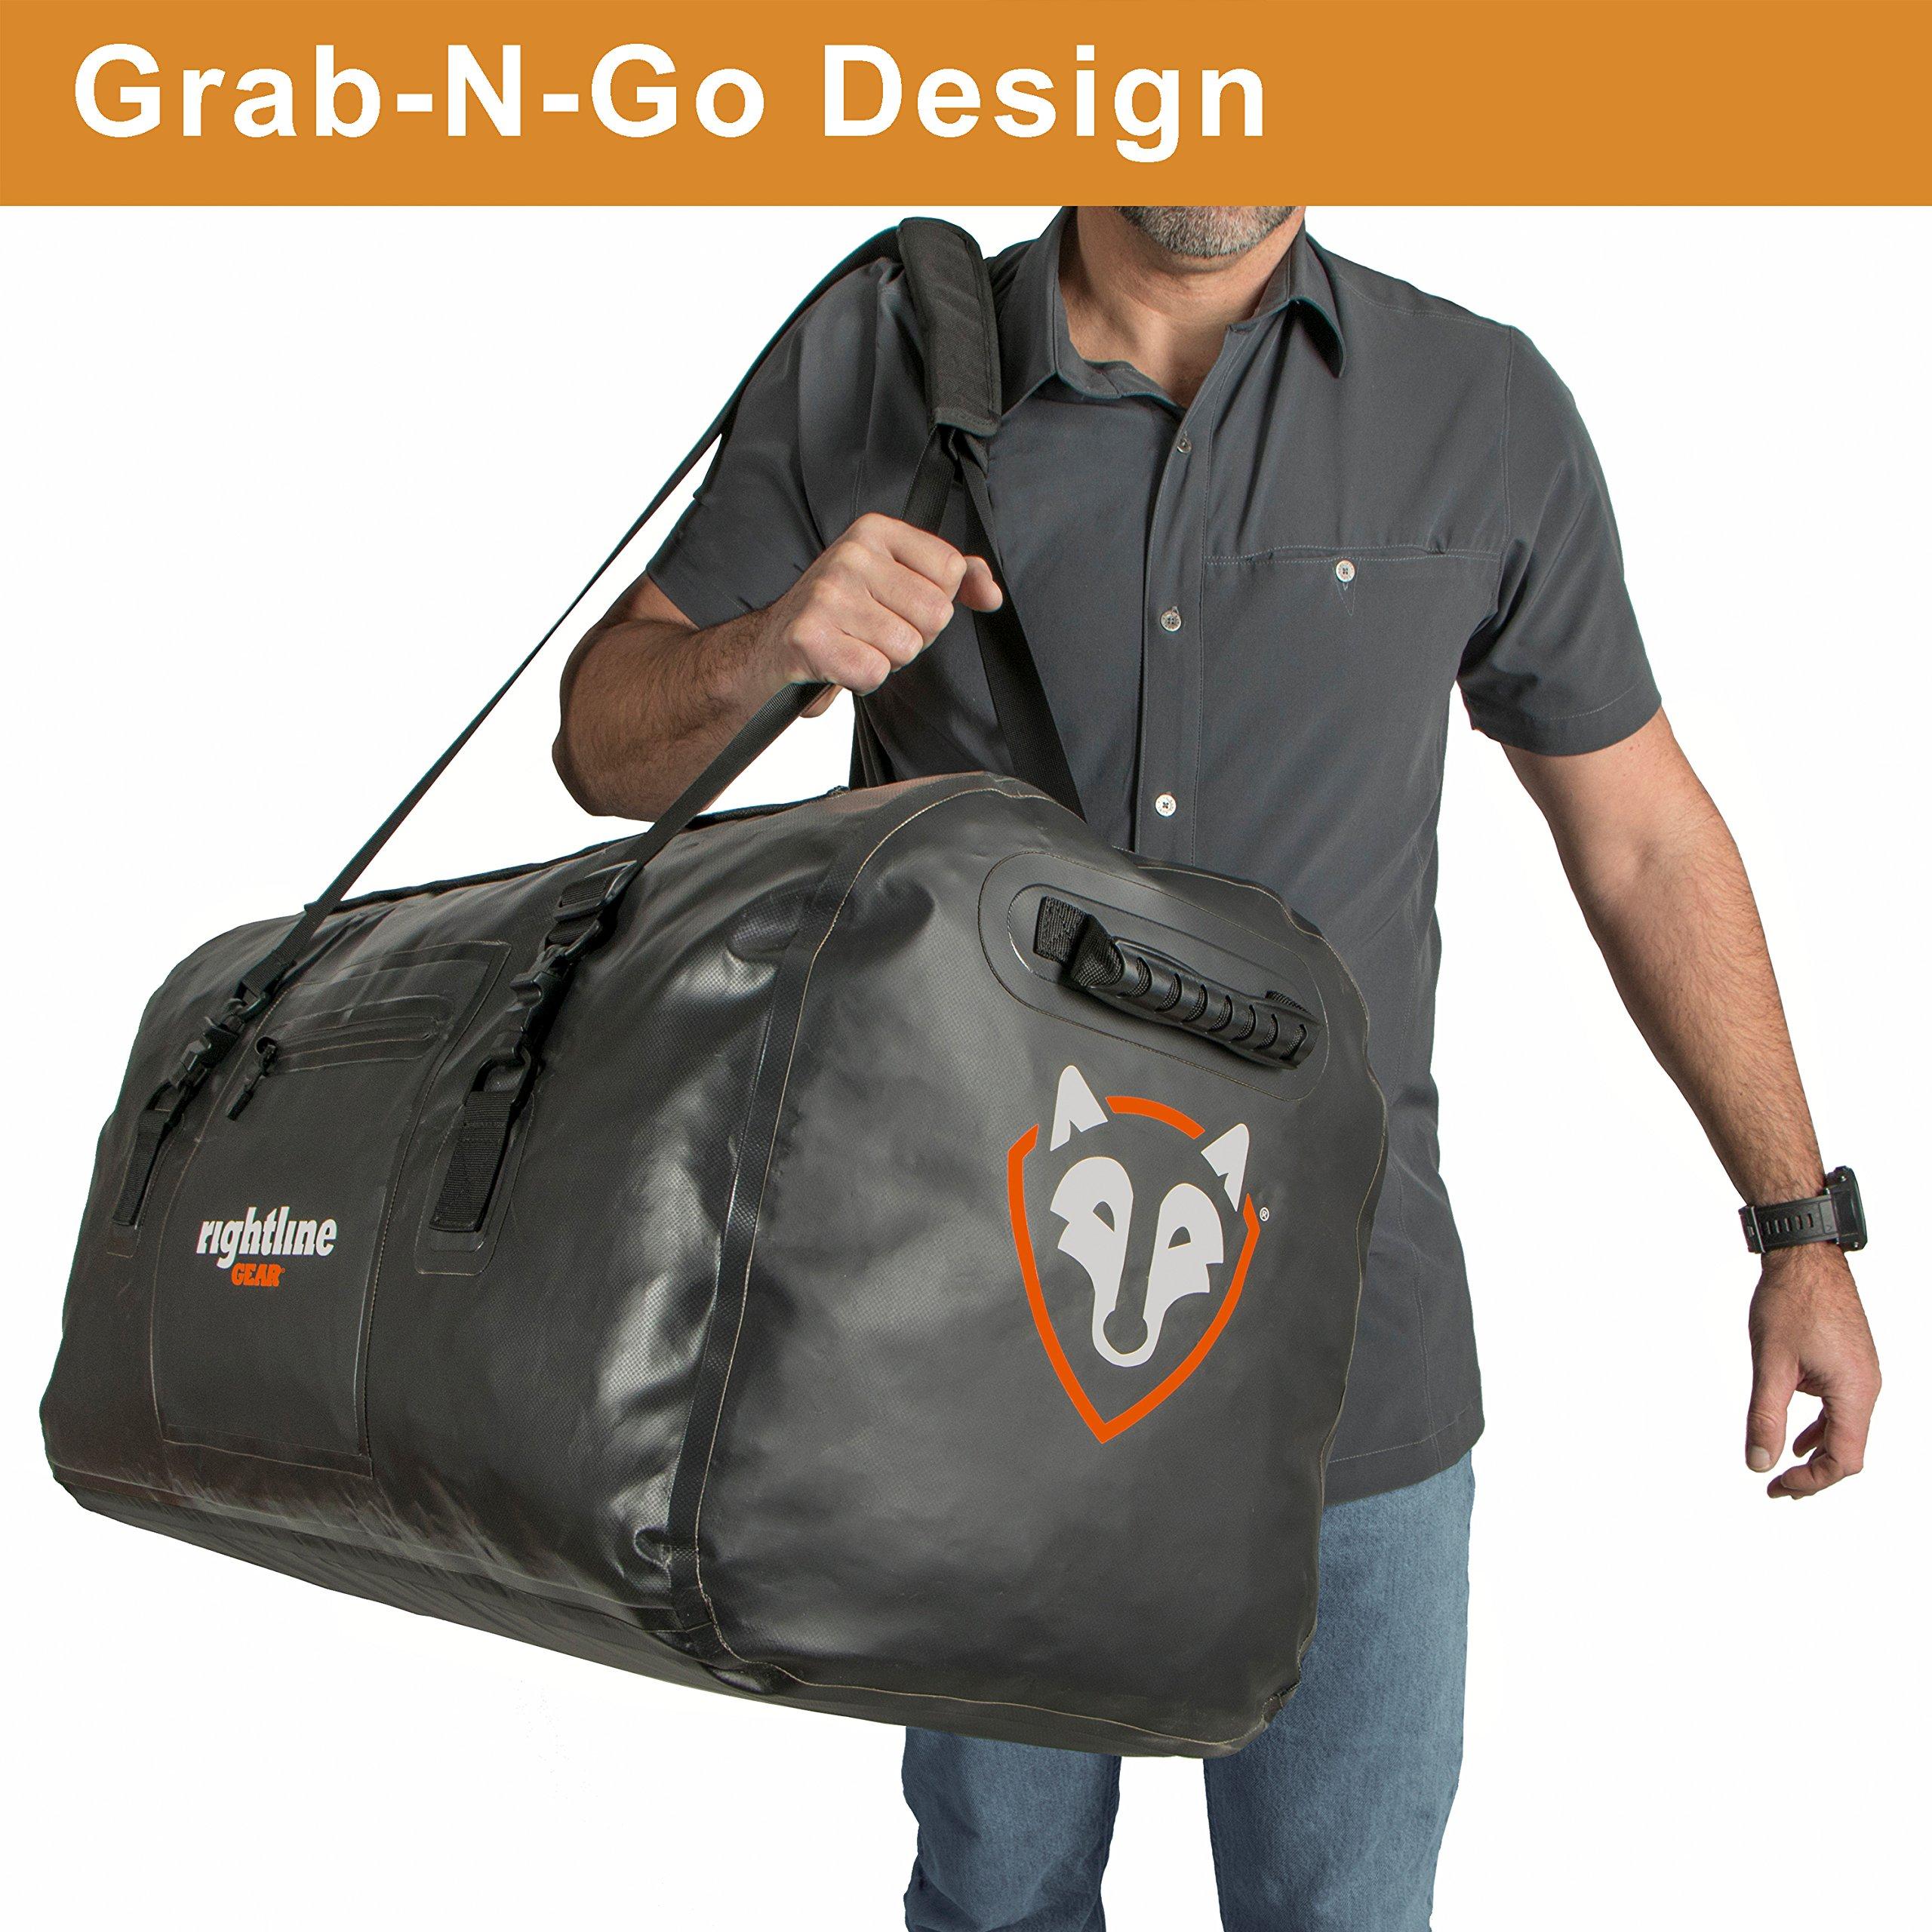 Rightline Gear 100J87-B 4x4 Duffle Bag (120L) by Rightline Gear (Image #9)